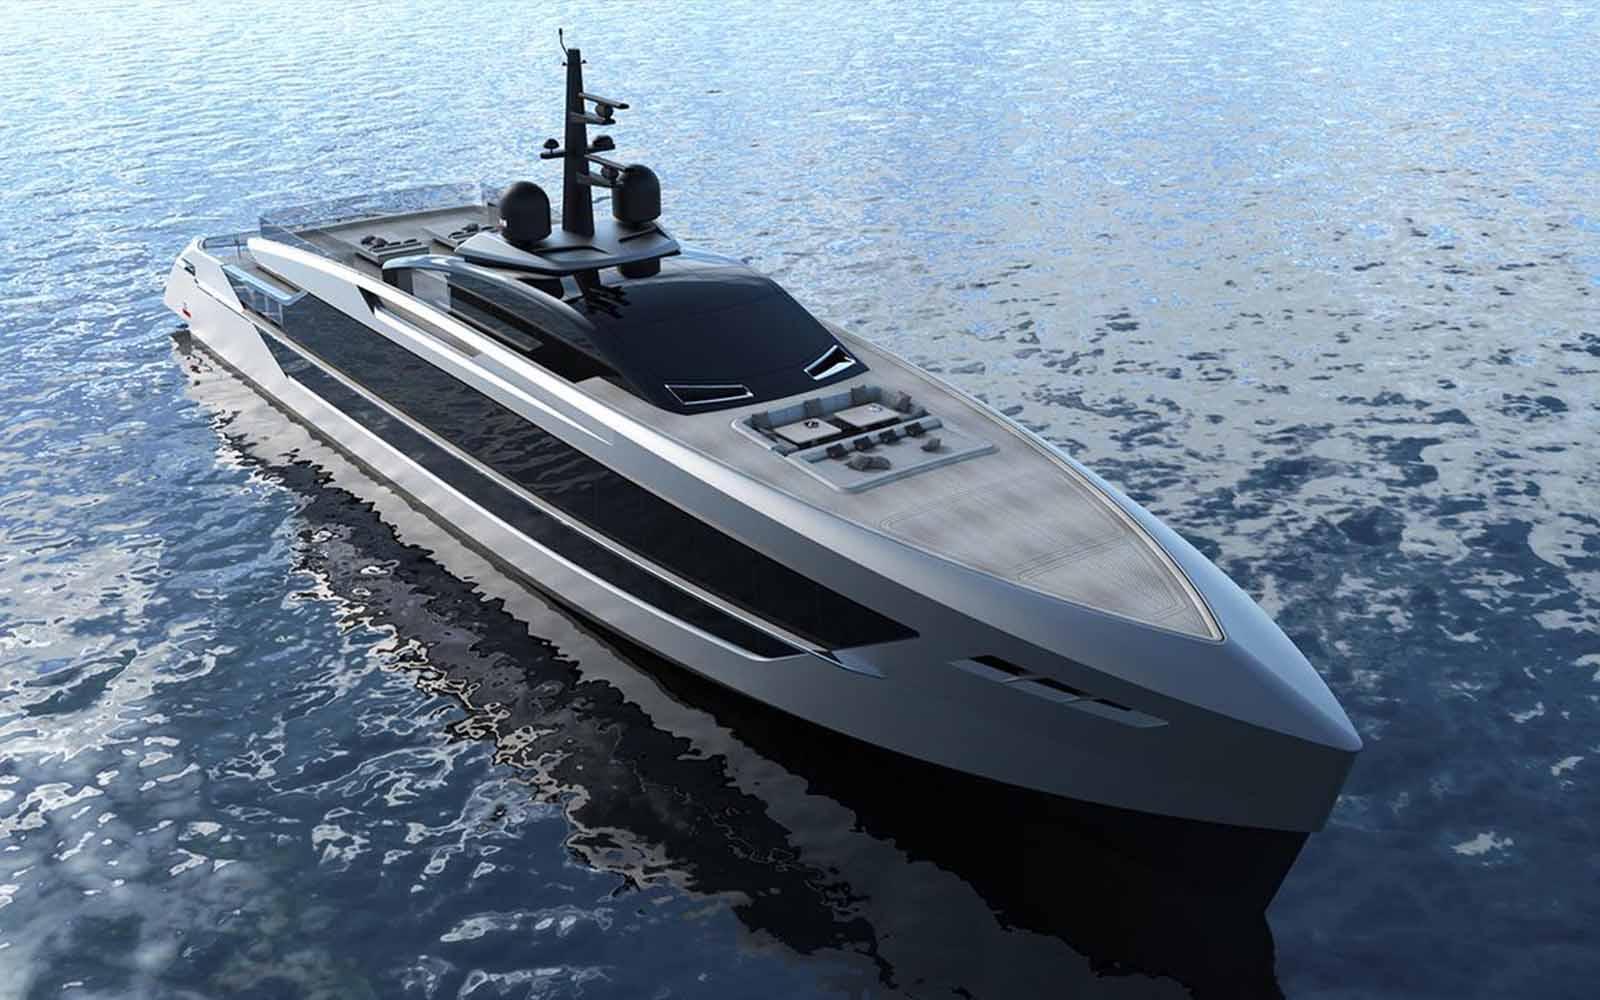 tankoa yachts superiate s533 saetta - boat shopping